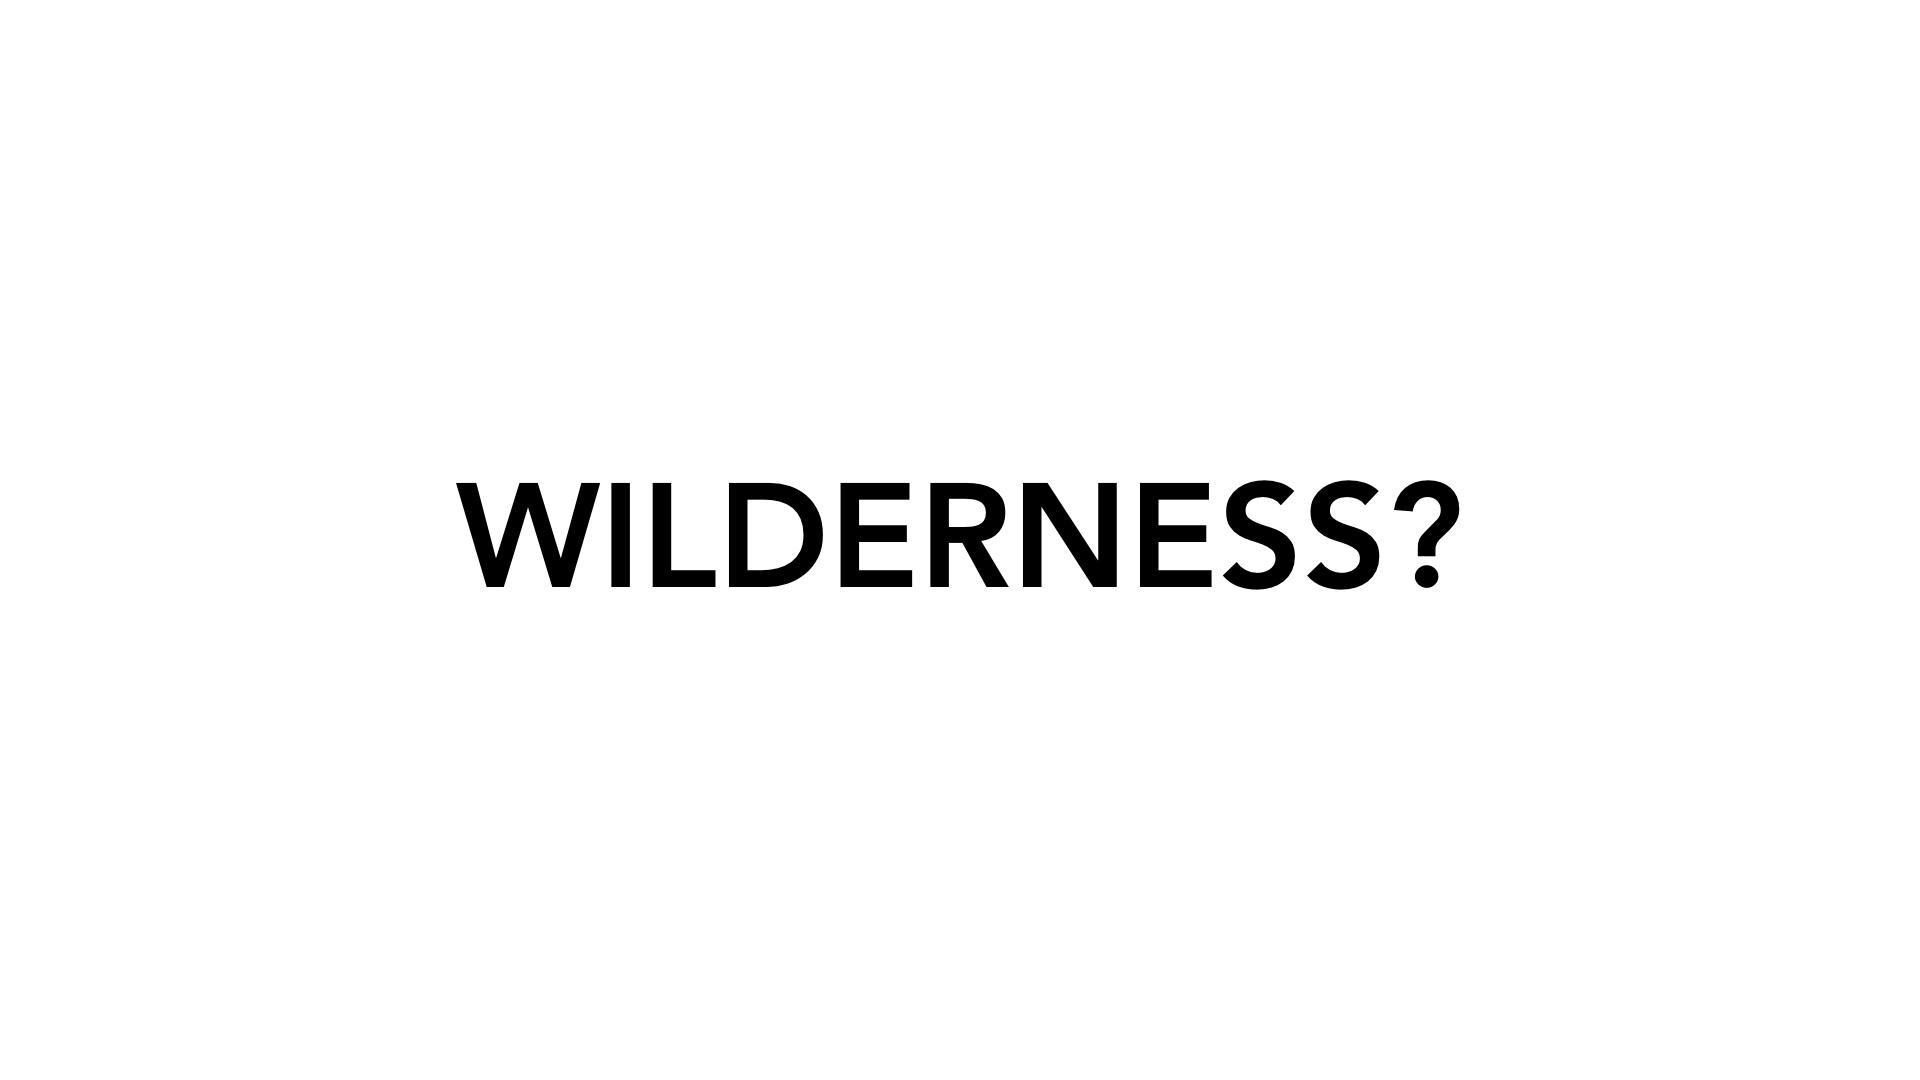 WILDERNESS-Maxlackner.003.jpeg